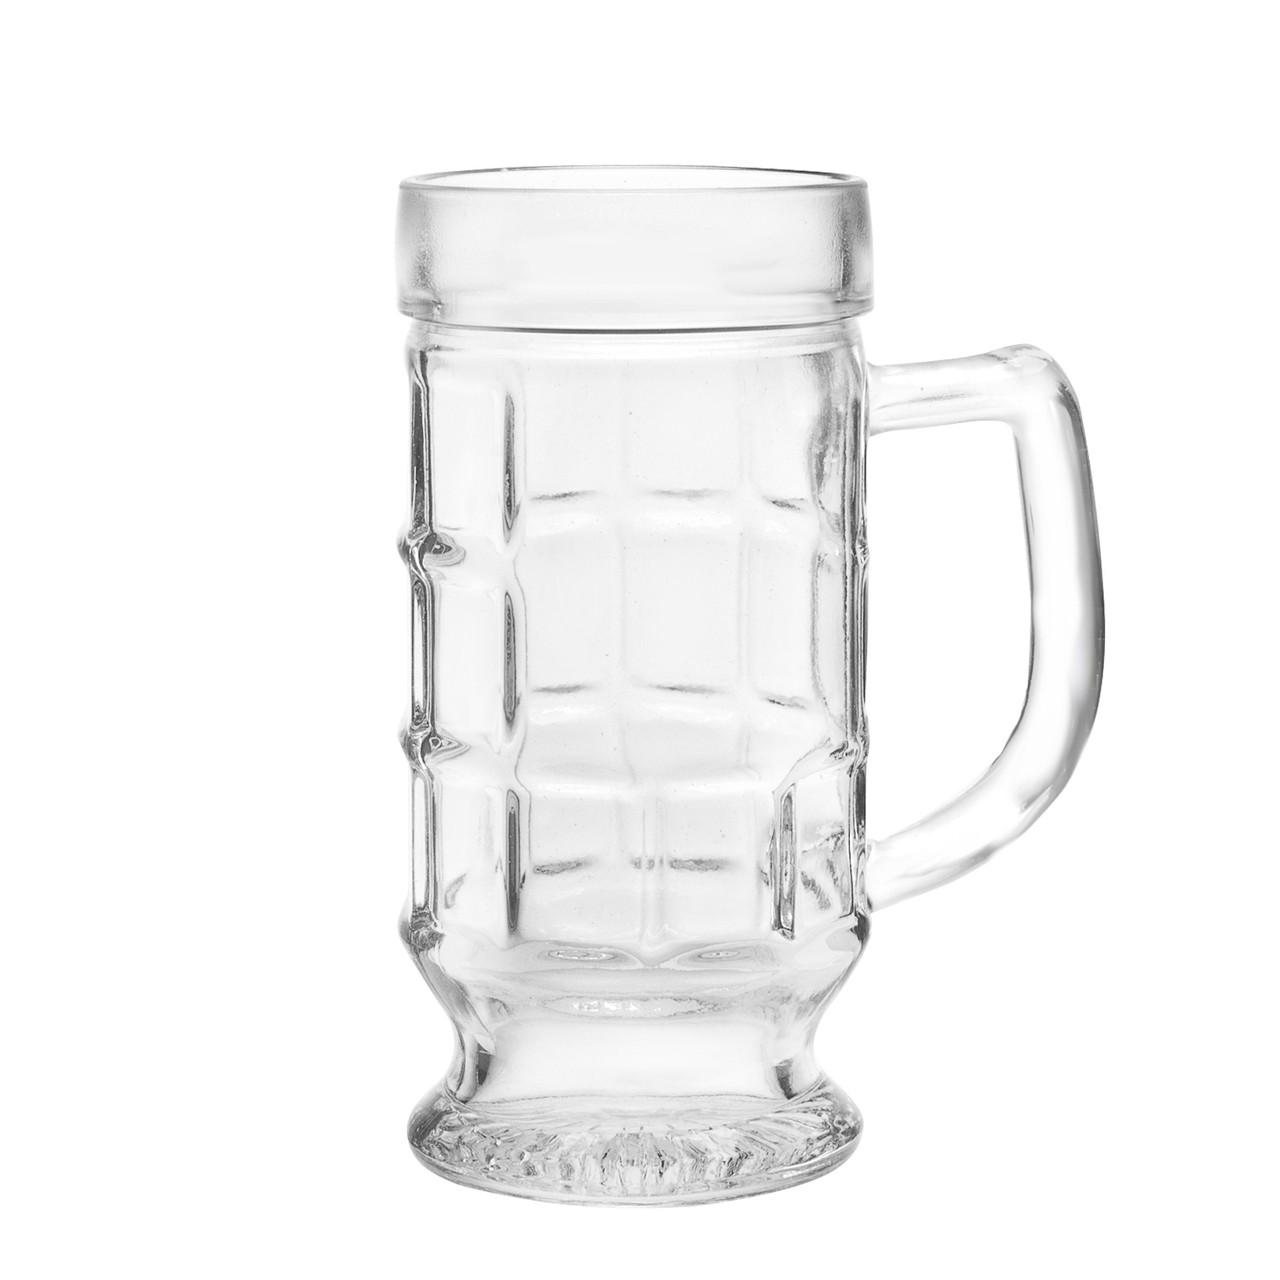 Кружка для пива ПЛОТЫЧА 500мл.